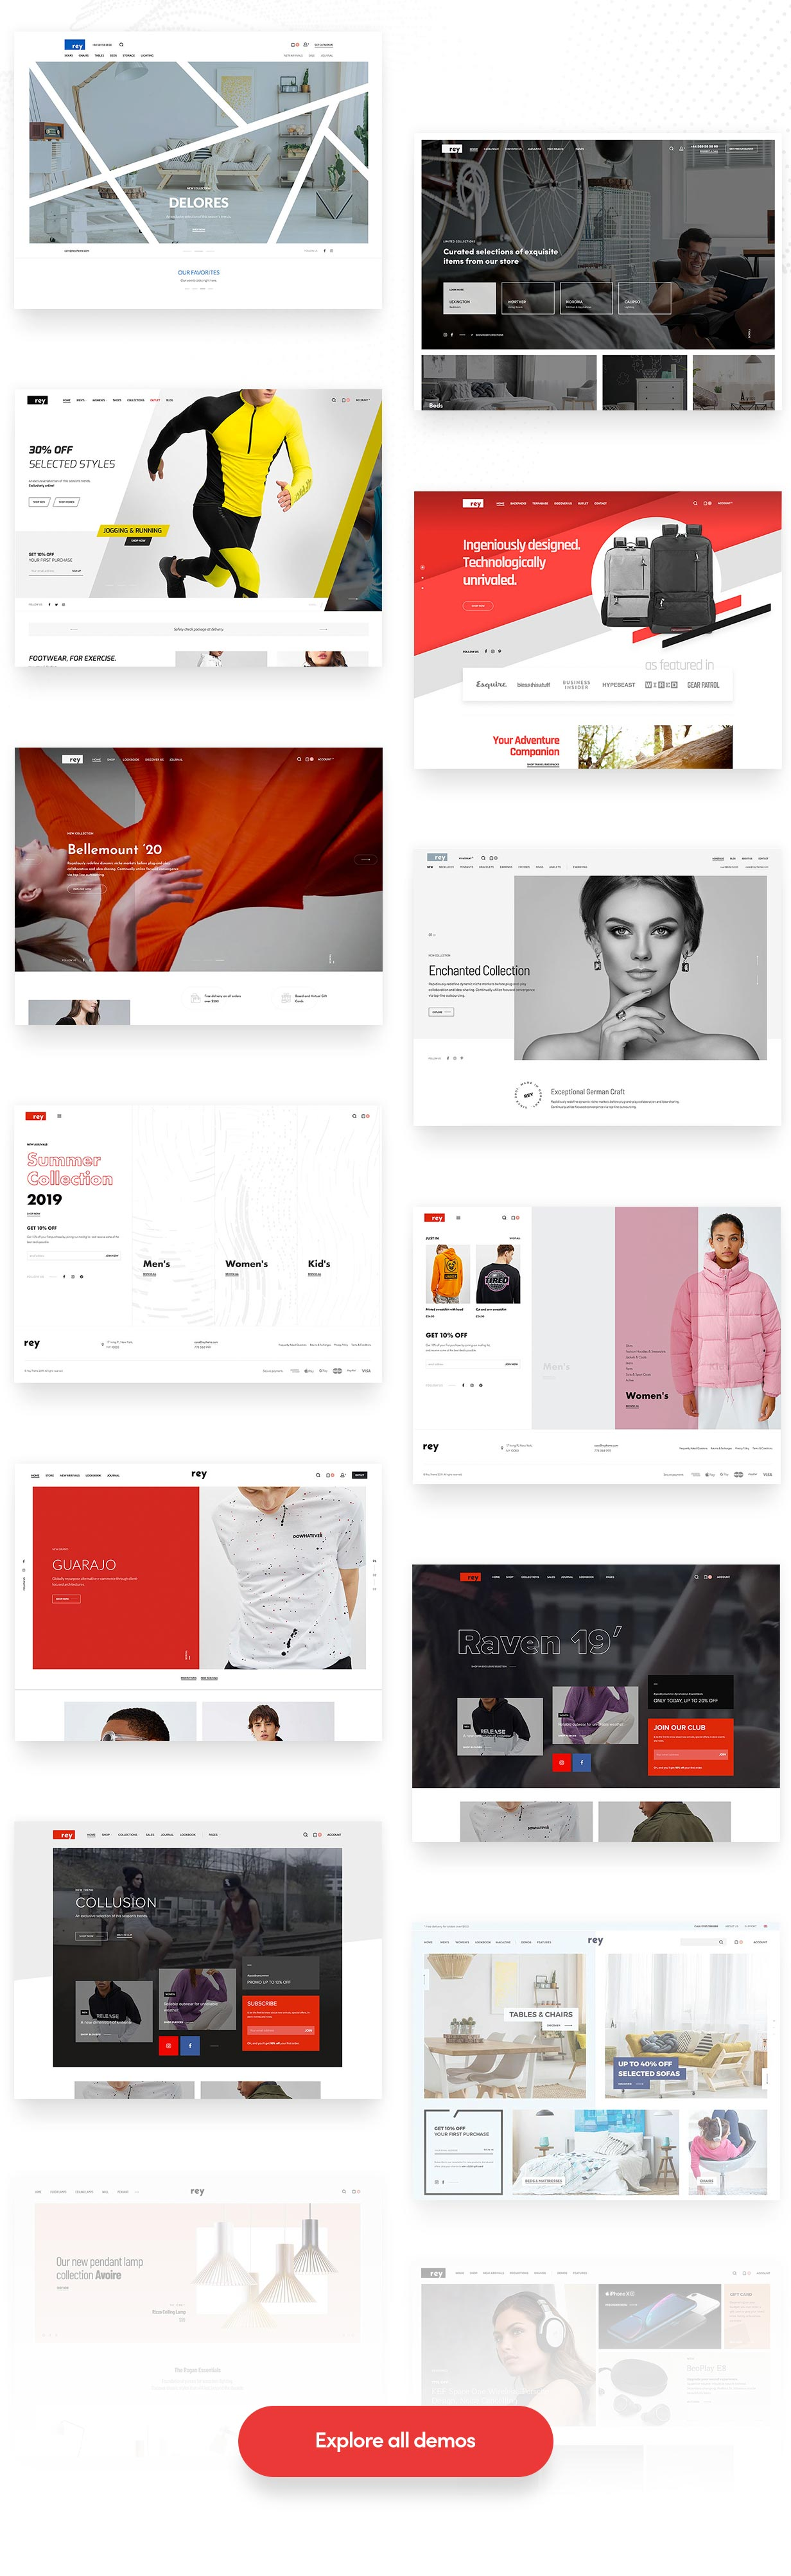 Rey -服装家具商品商店WordPress模板-创客云